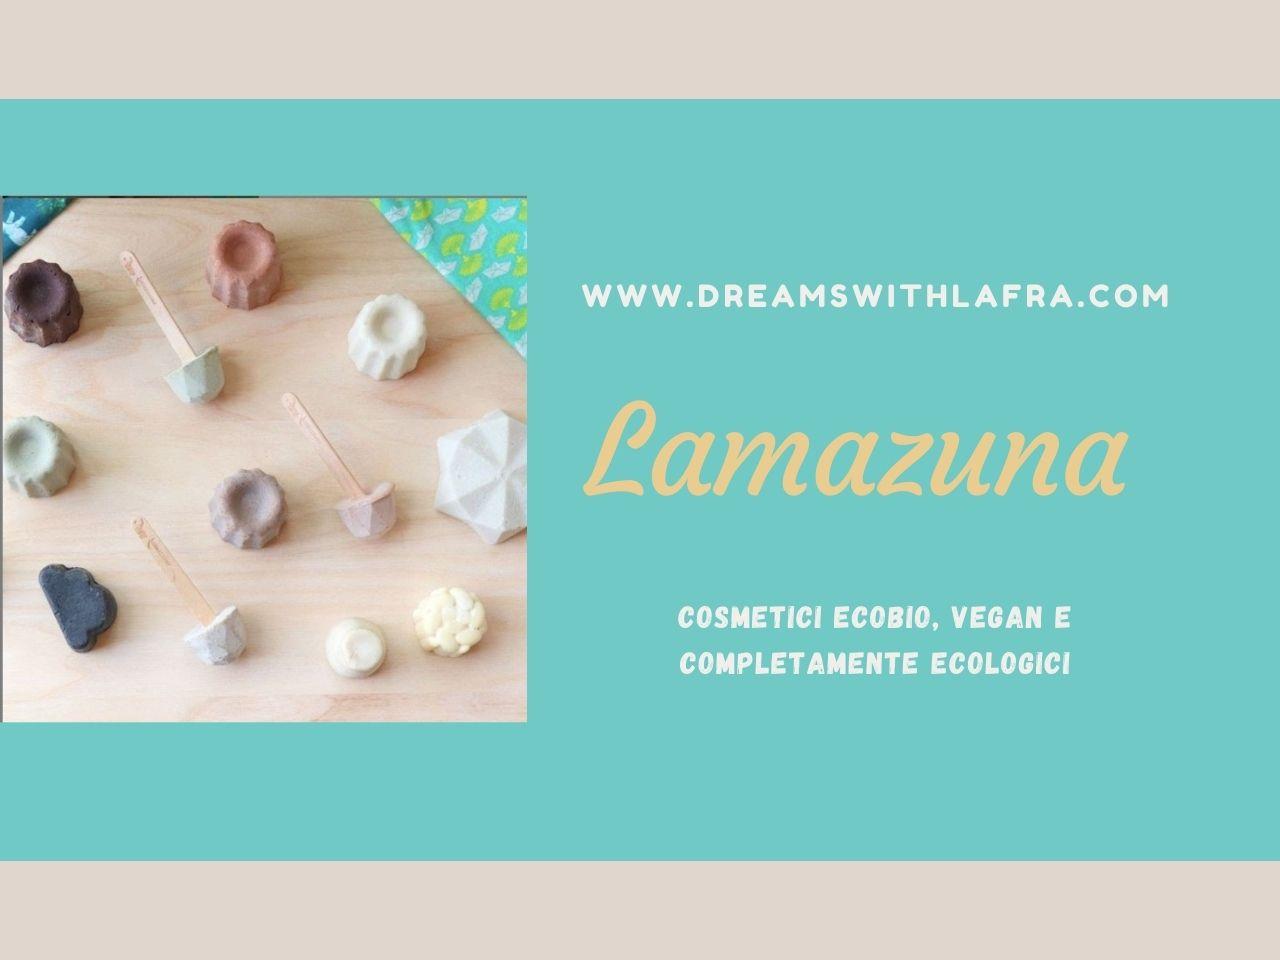 Lamazuna - Cosmetici ecobio, vegan e completamente ecologici